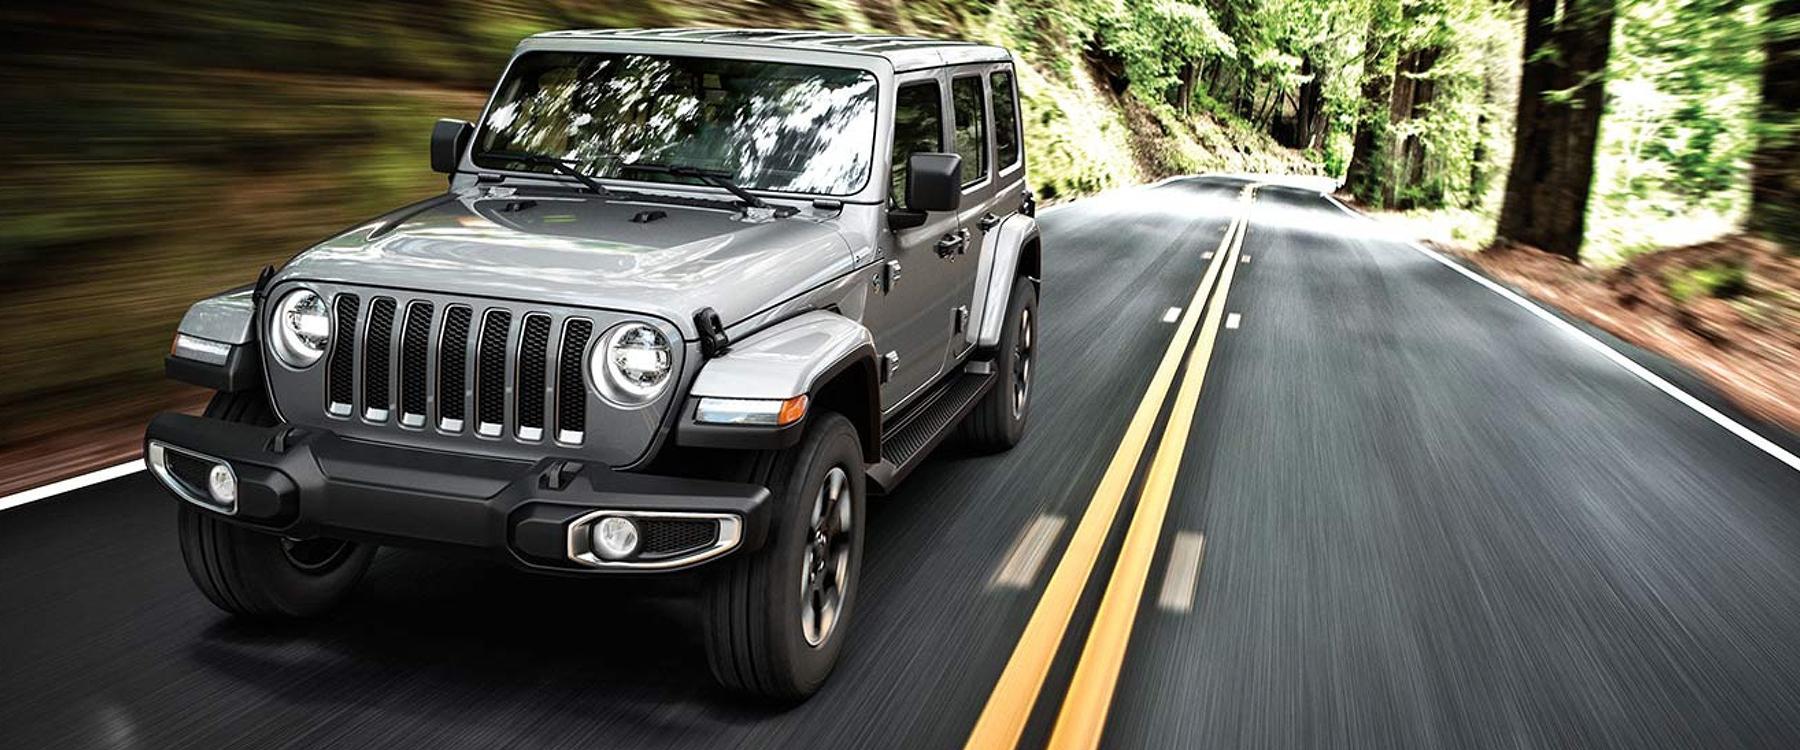 Jeep Wrangler JL Image